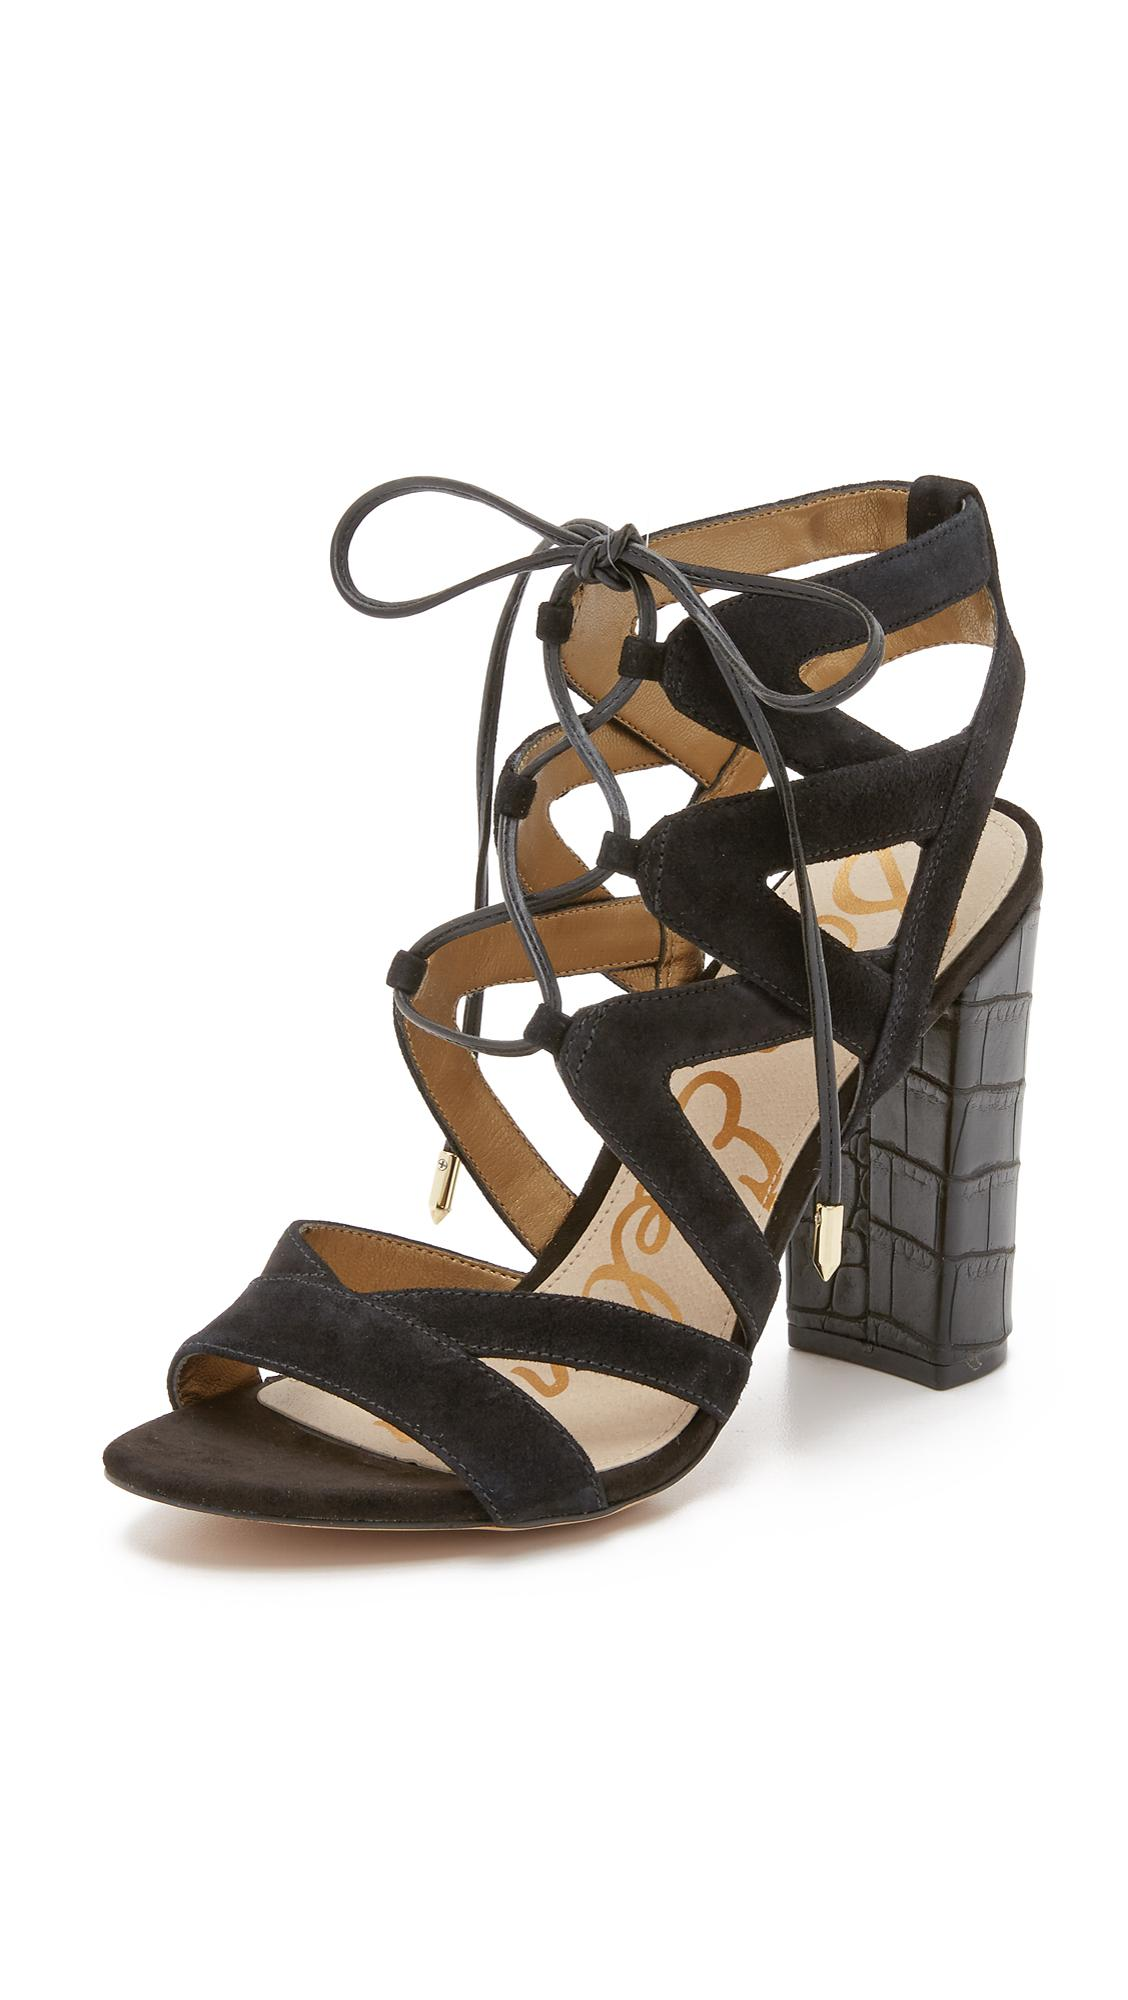 62d1141e61b41 Sam Edelman Yardley Lace Up Sandals in Black - Lyst